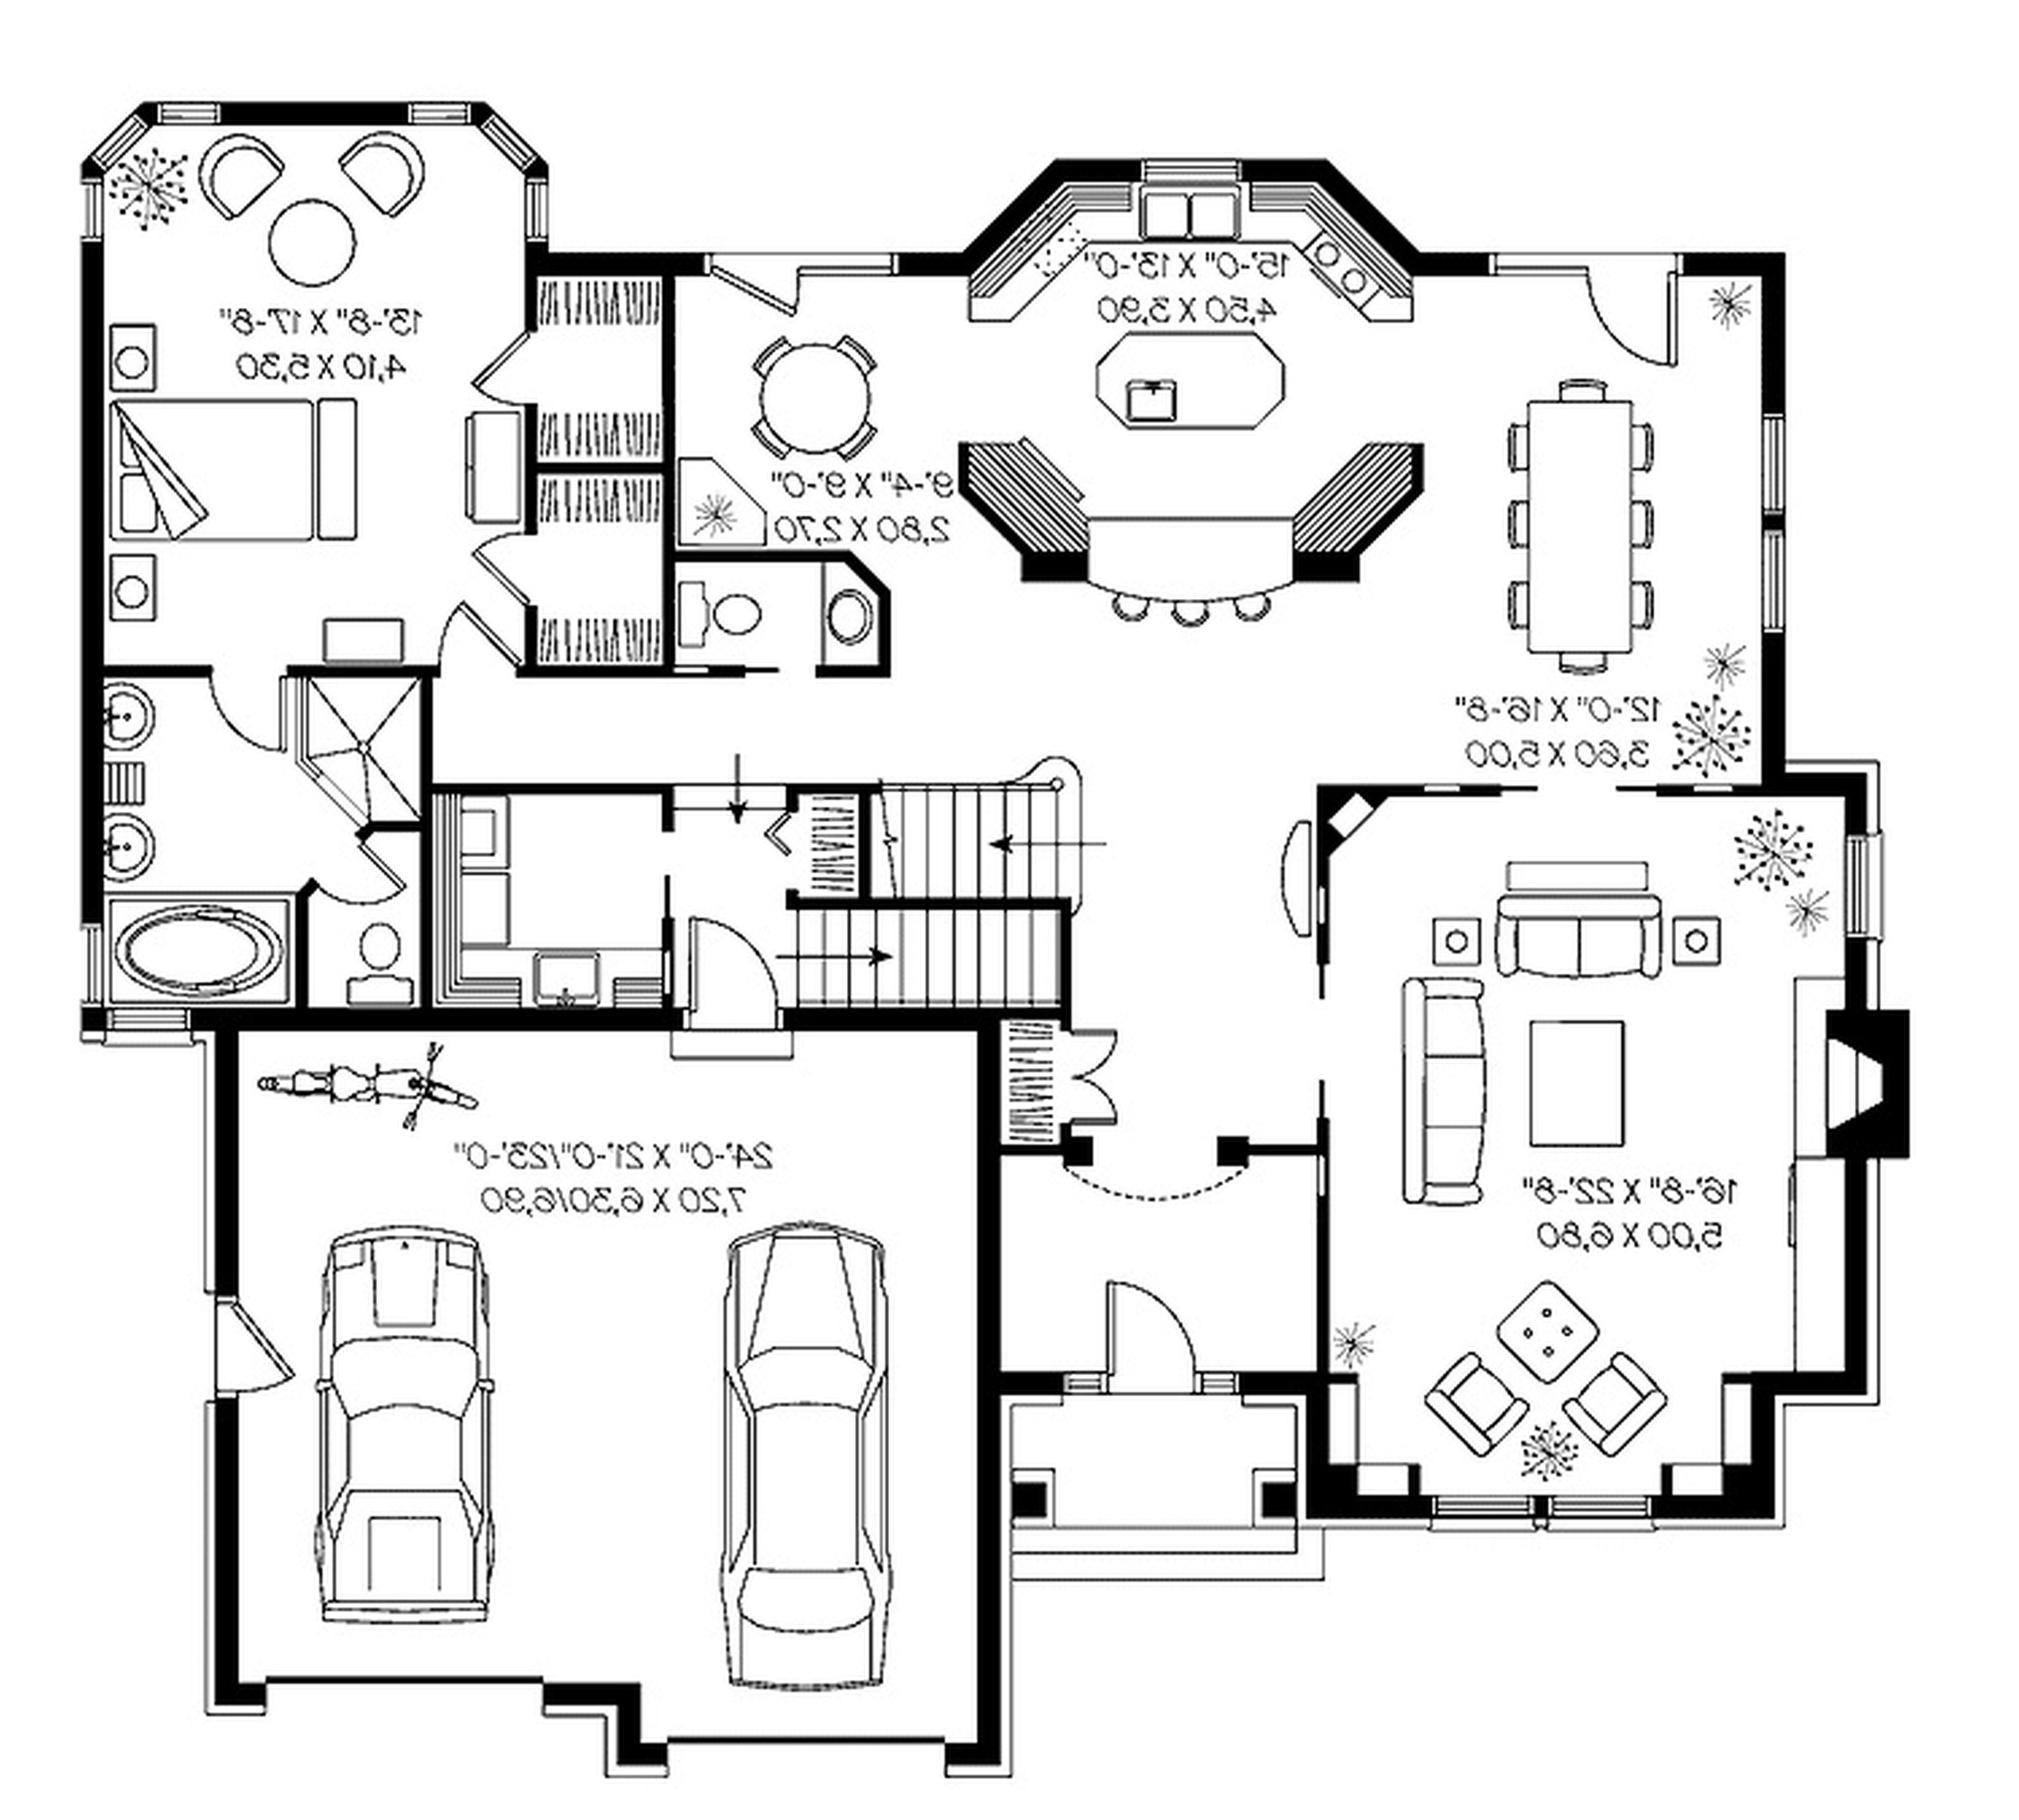 Home Room Apartment Kitchen Bathroom Bedroom Office